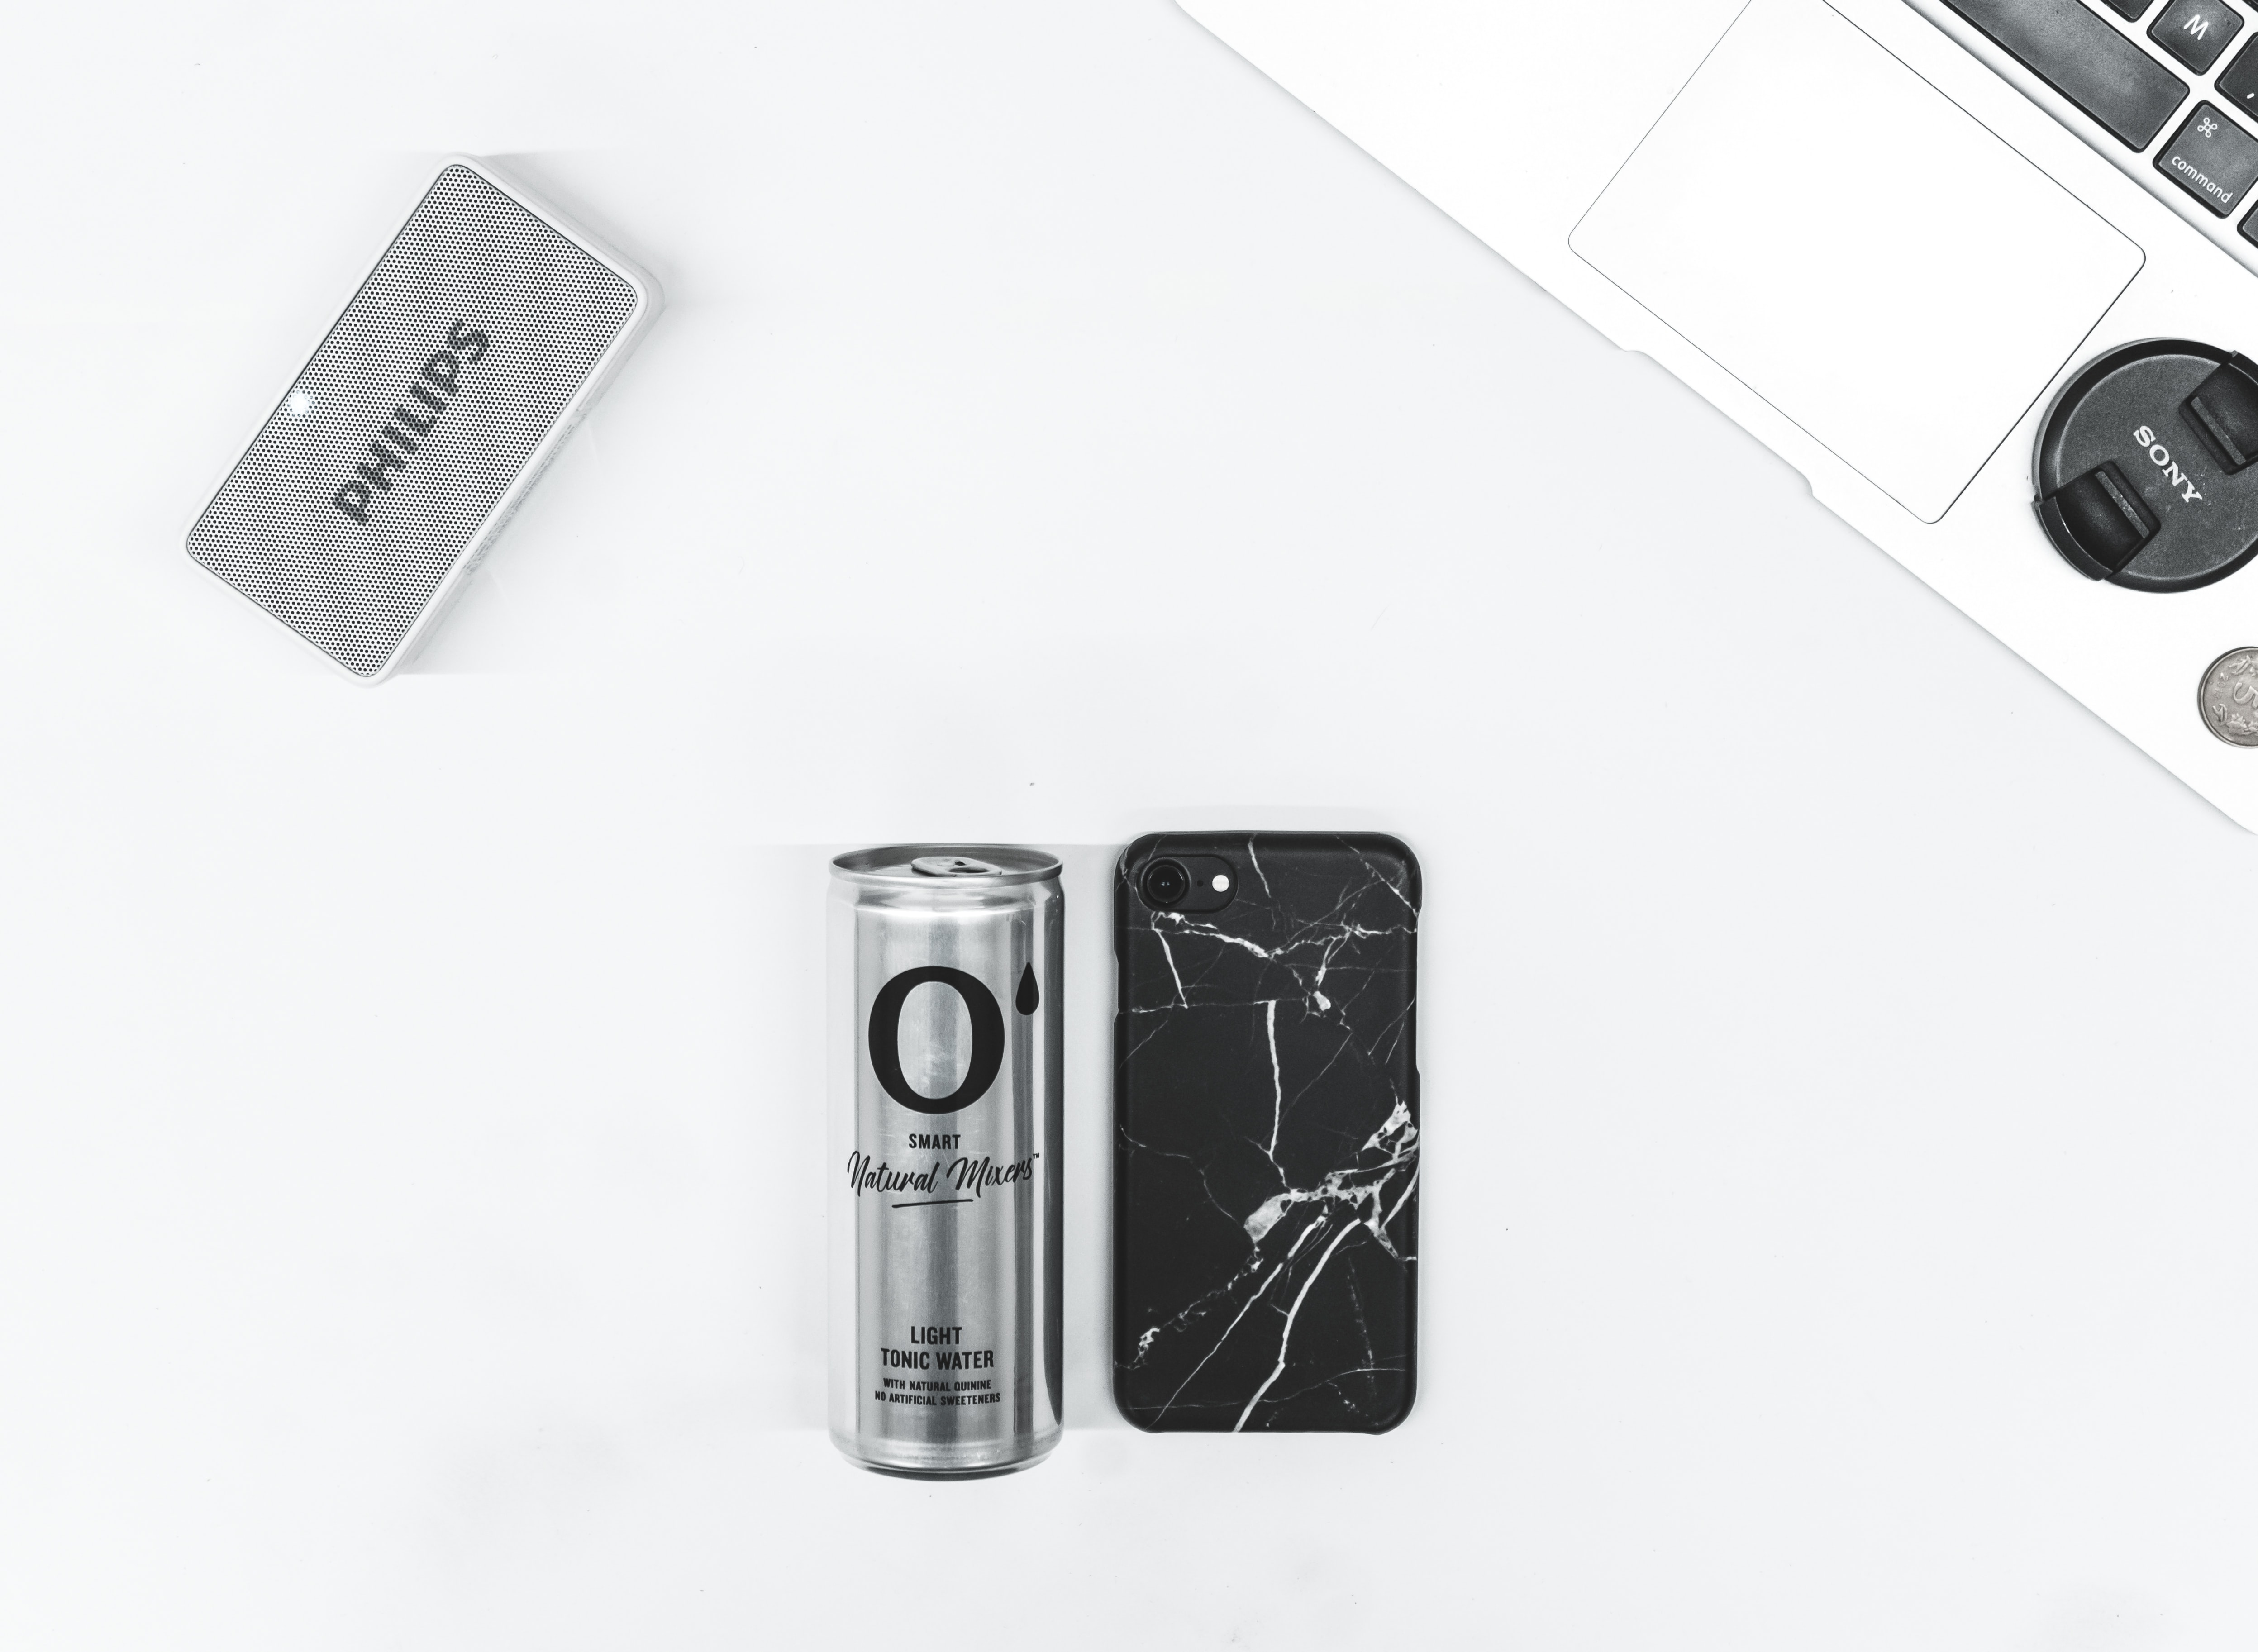 black iPhone 7 beside cna